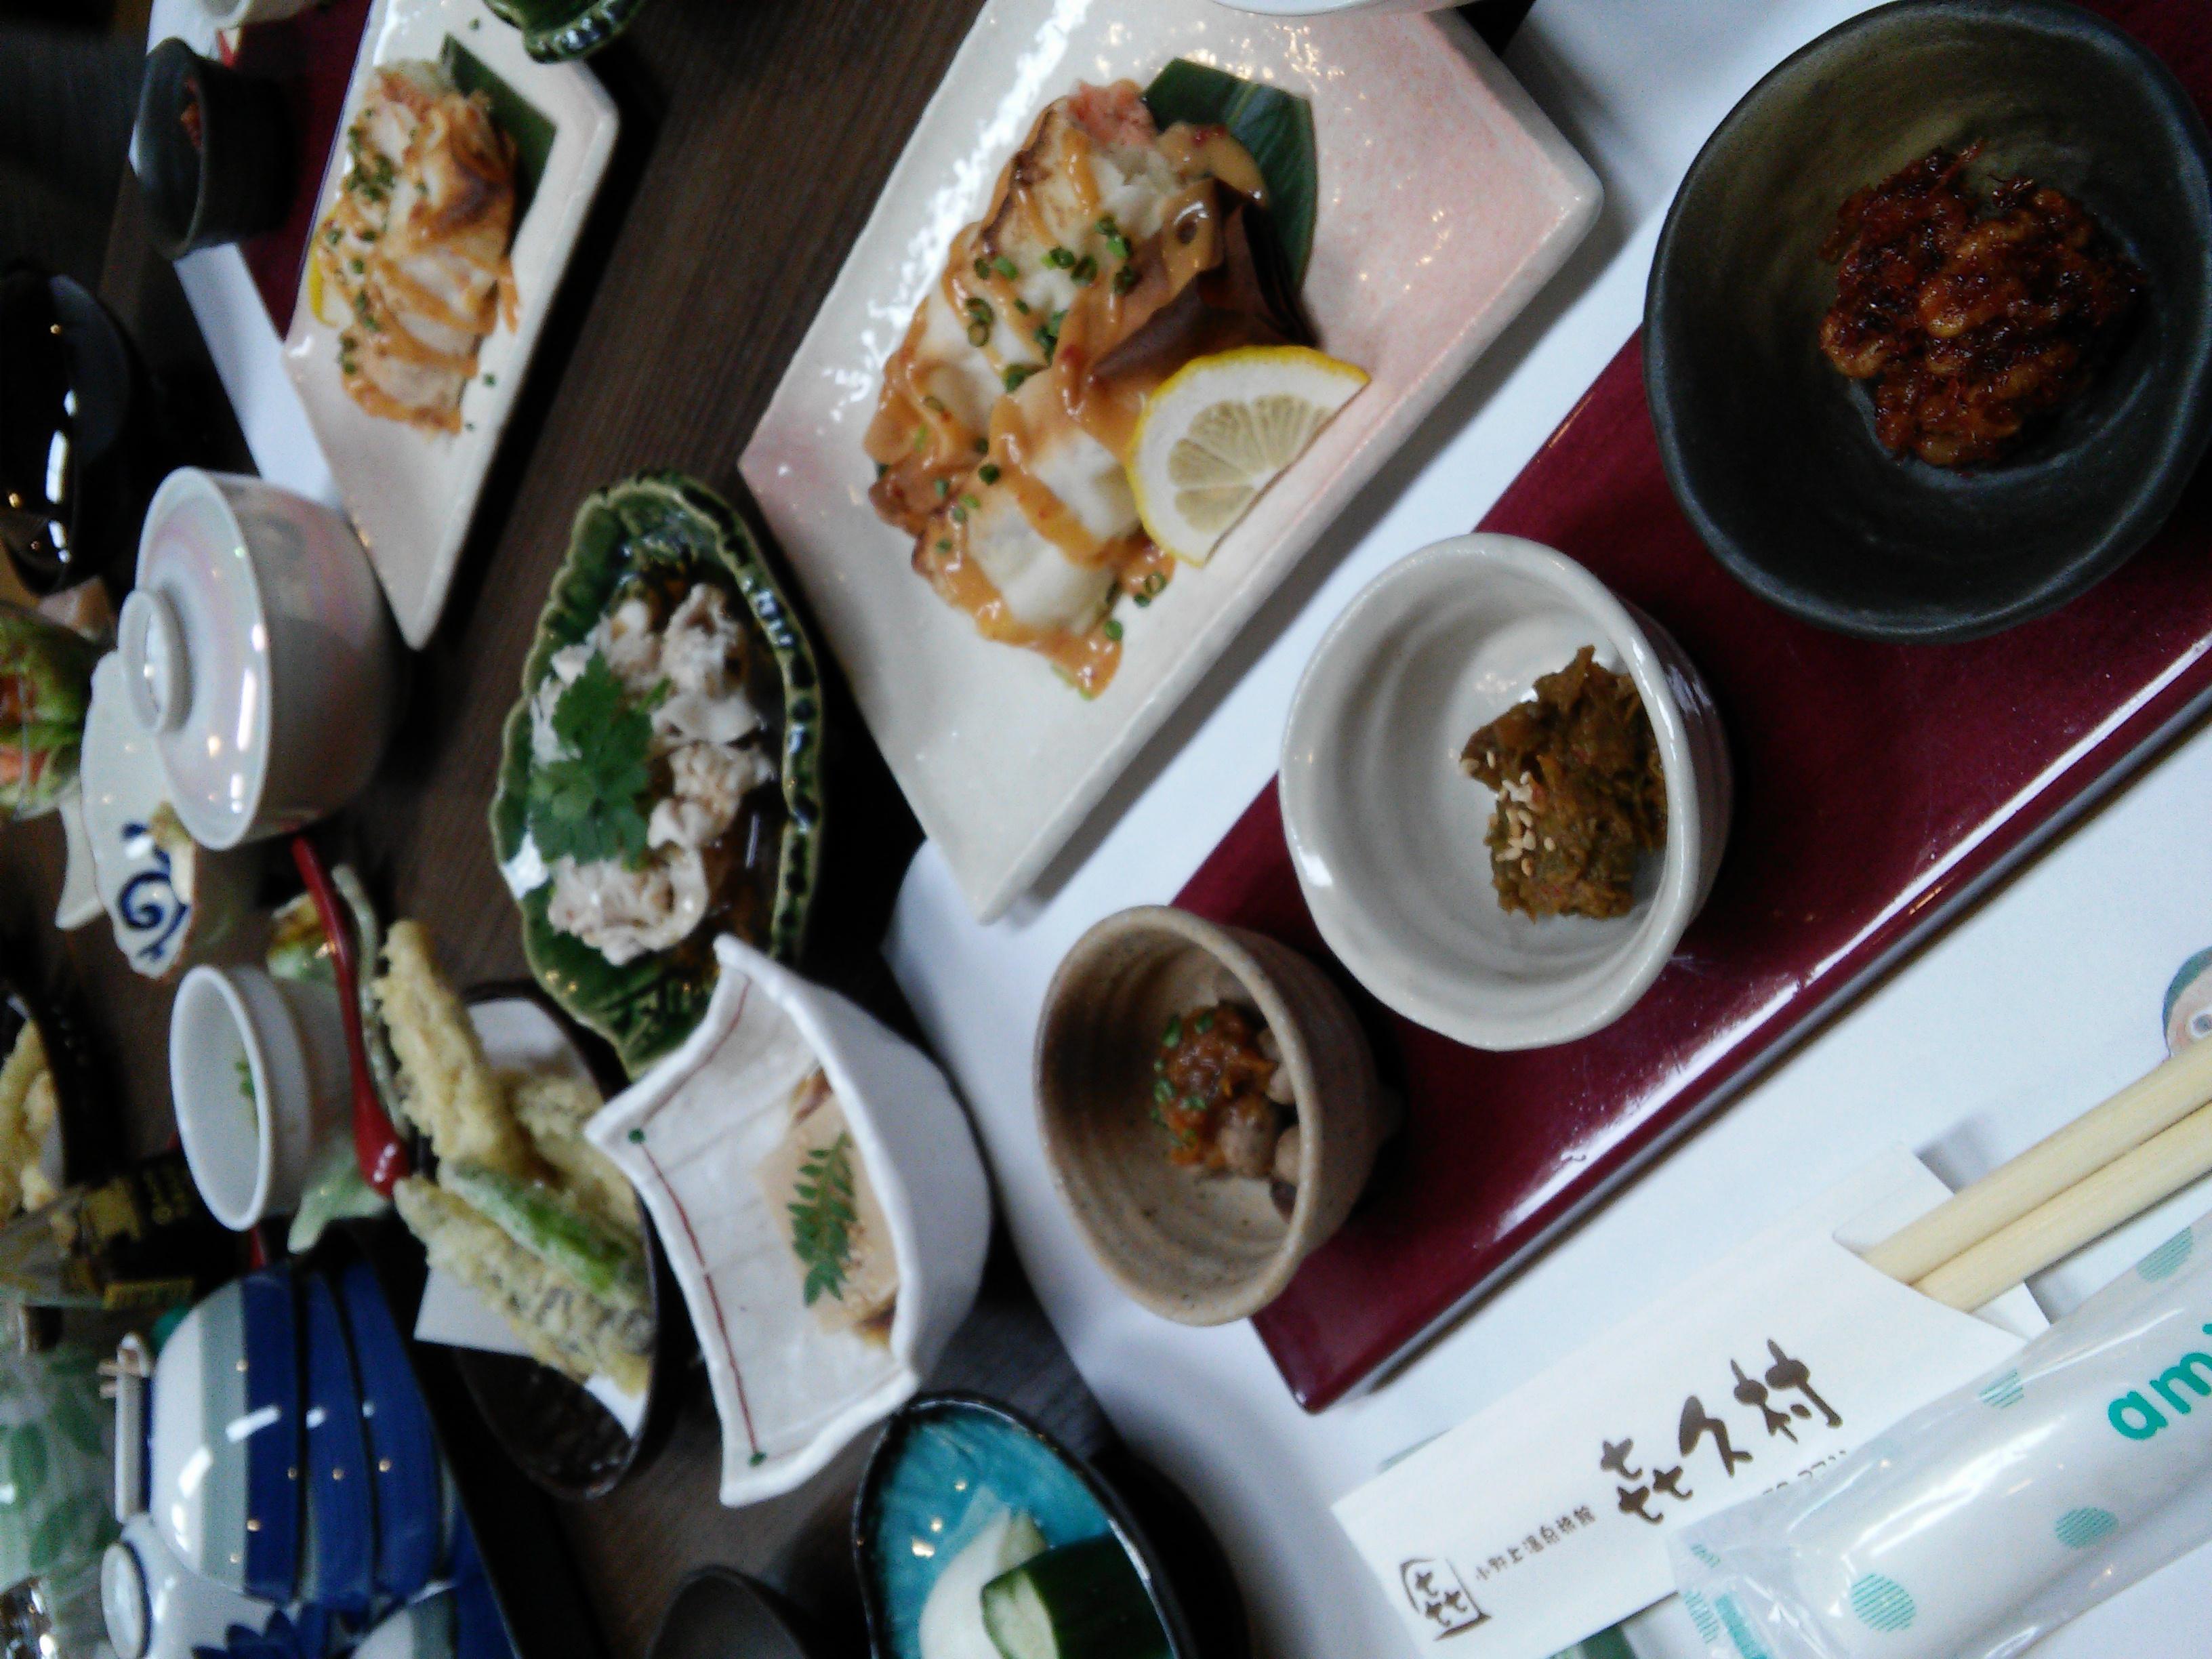 kikumura dinner